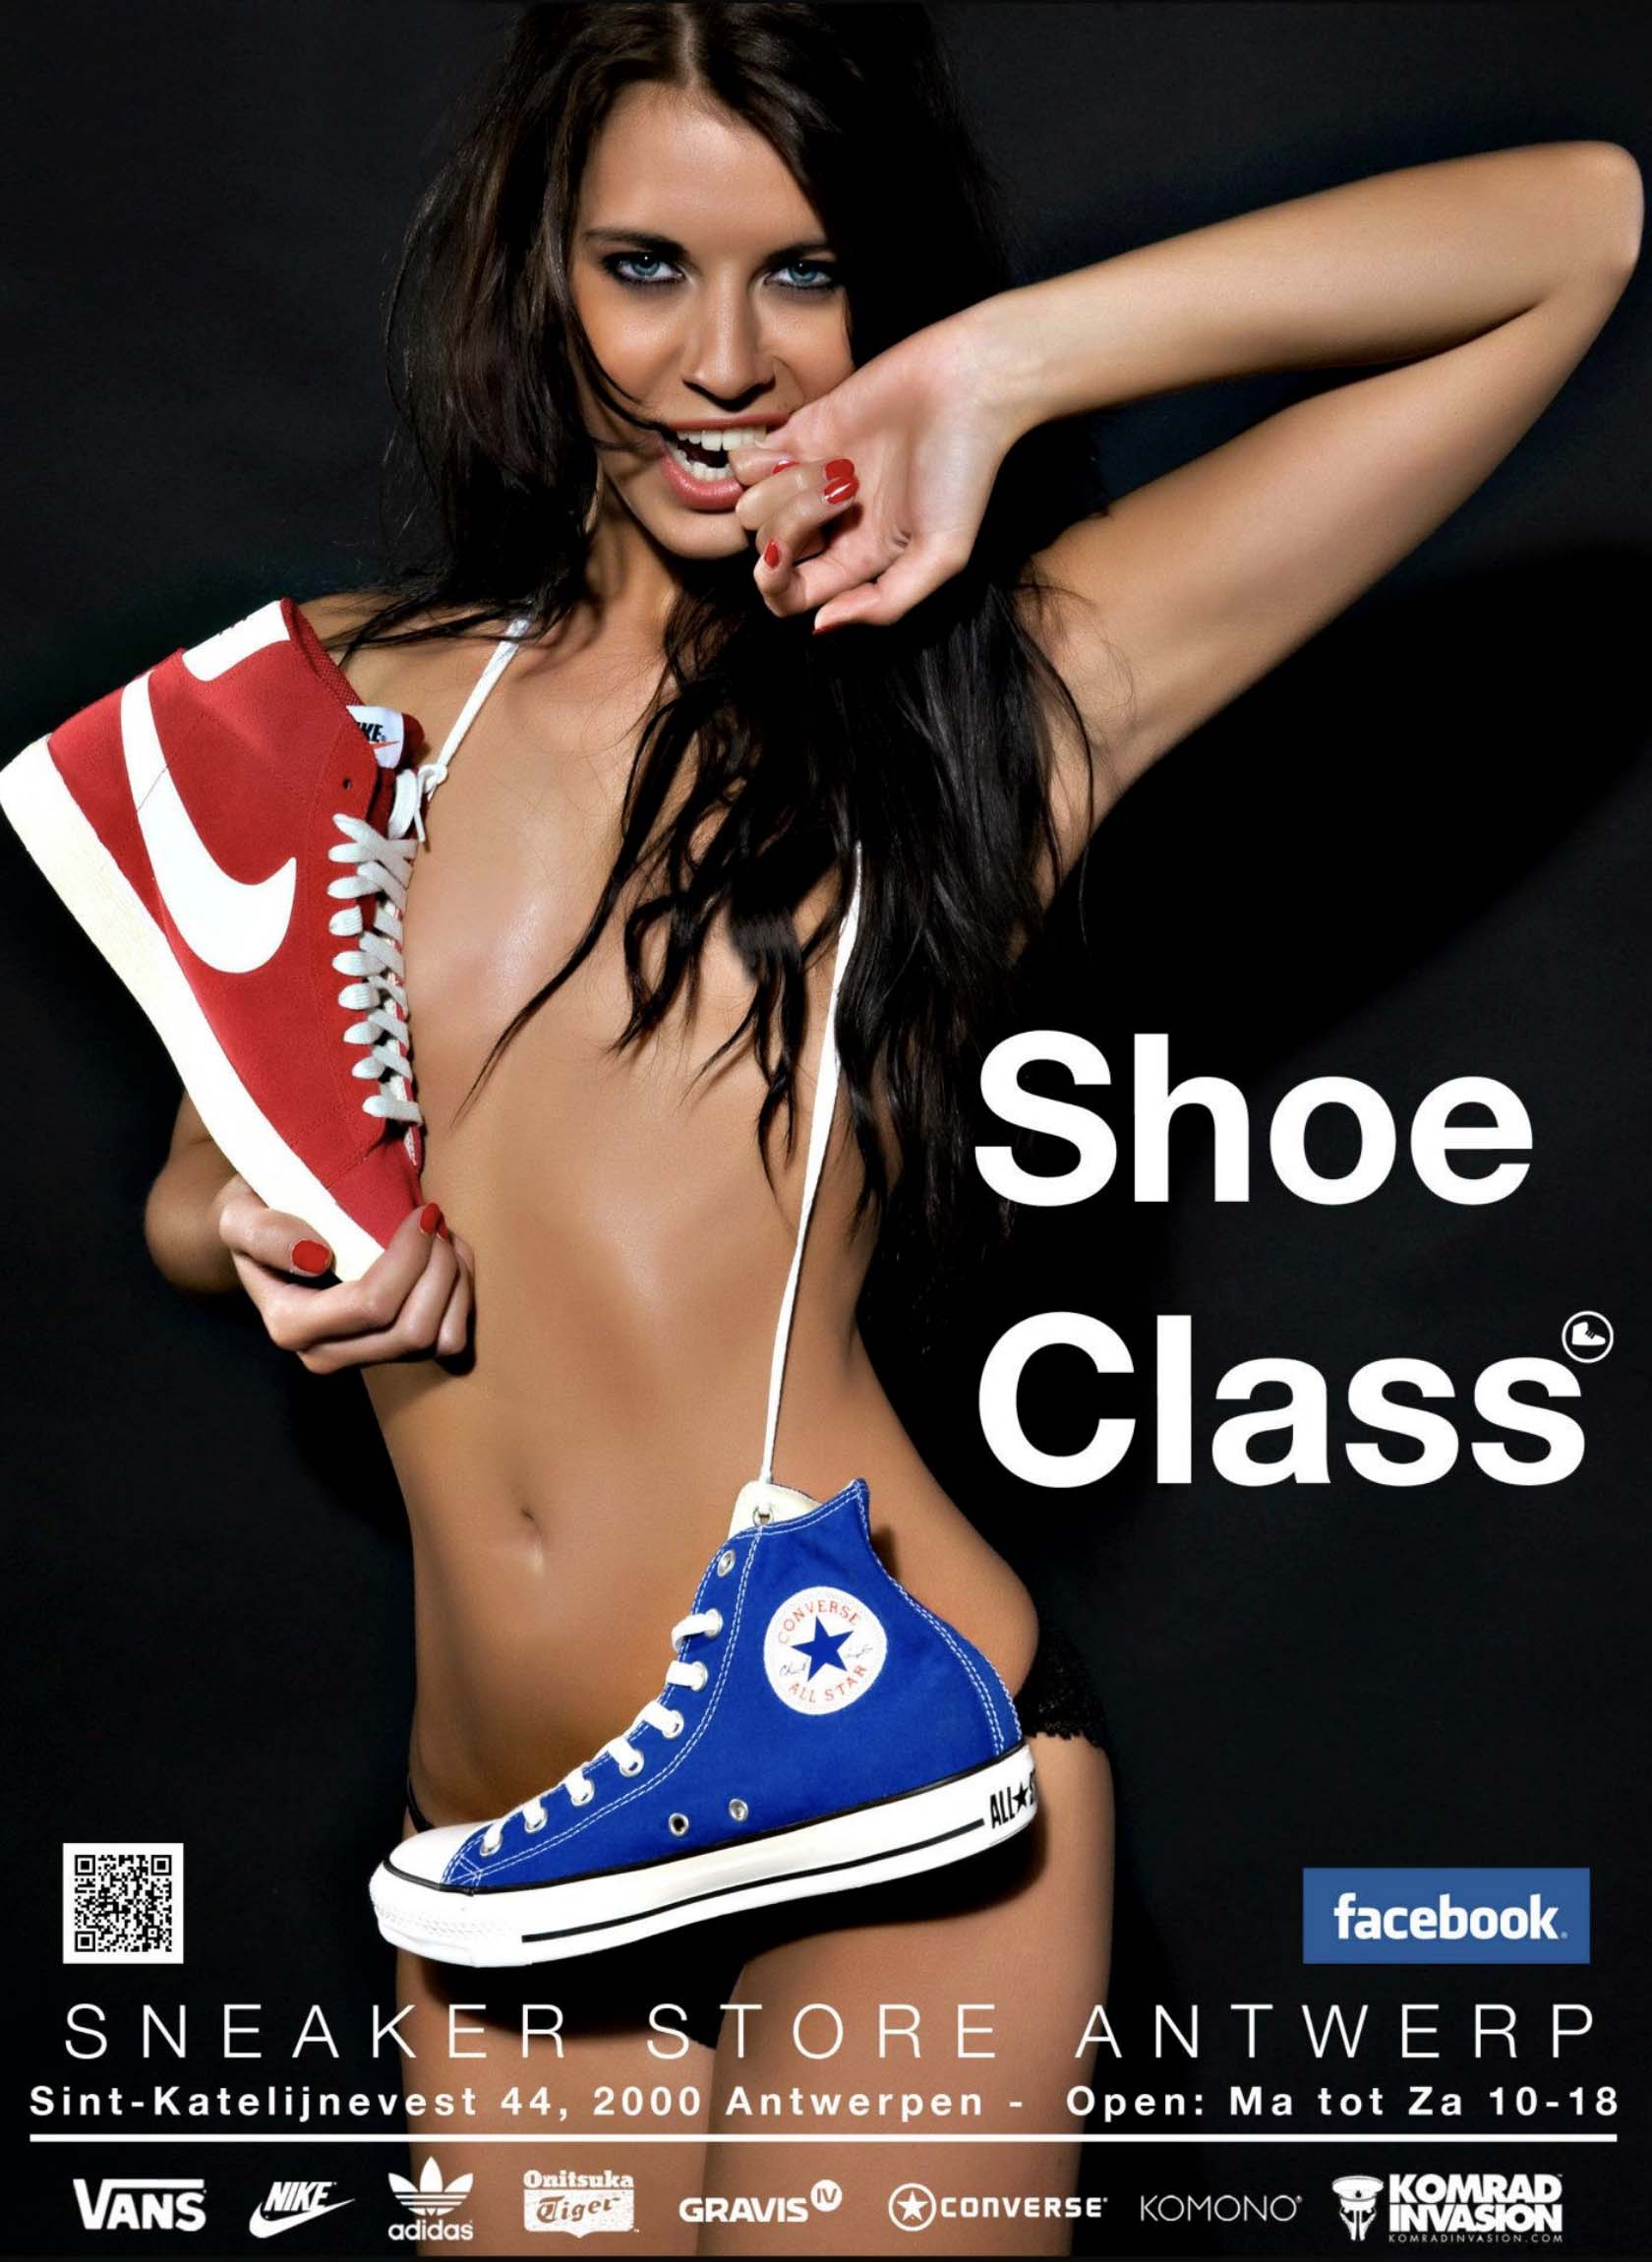 2 shoeclass models shoes all star bart albrecht fotograaf photographer belgium p magazine che playboy editorial magazines glamour boudoir daniela degraux kelly buytaert 0011.jpg